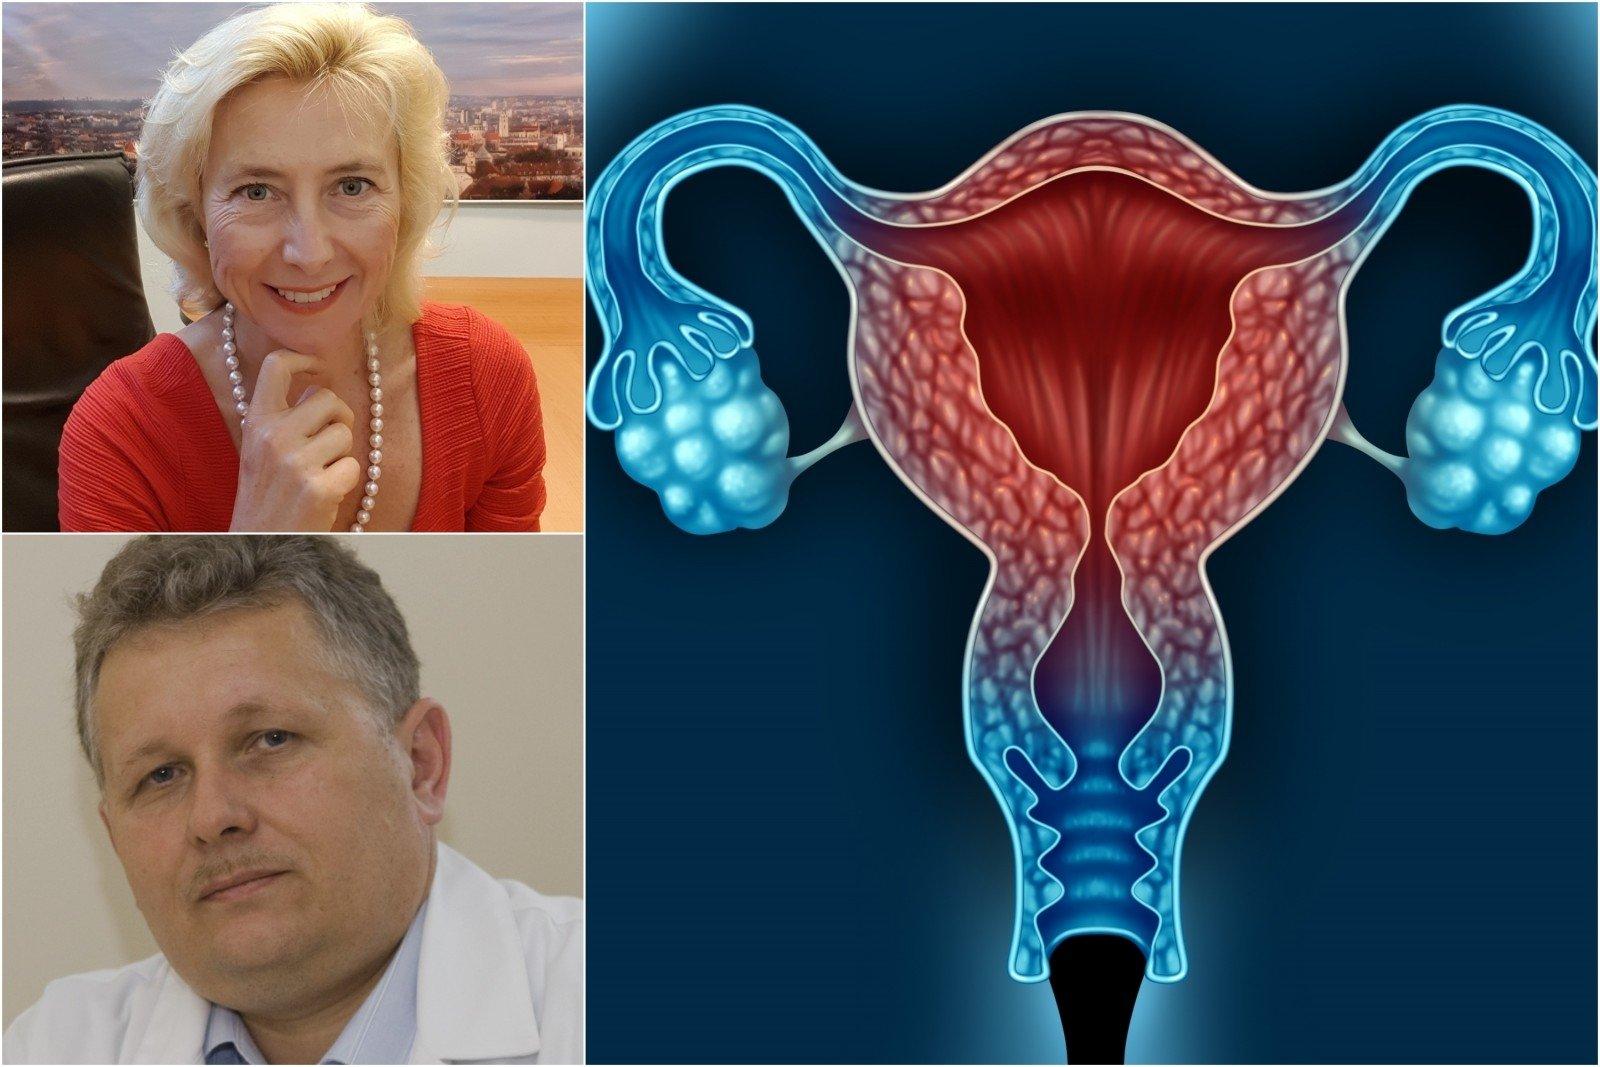 širdies sveikata po menopauzės)